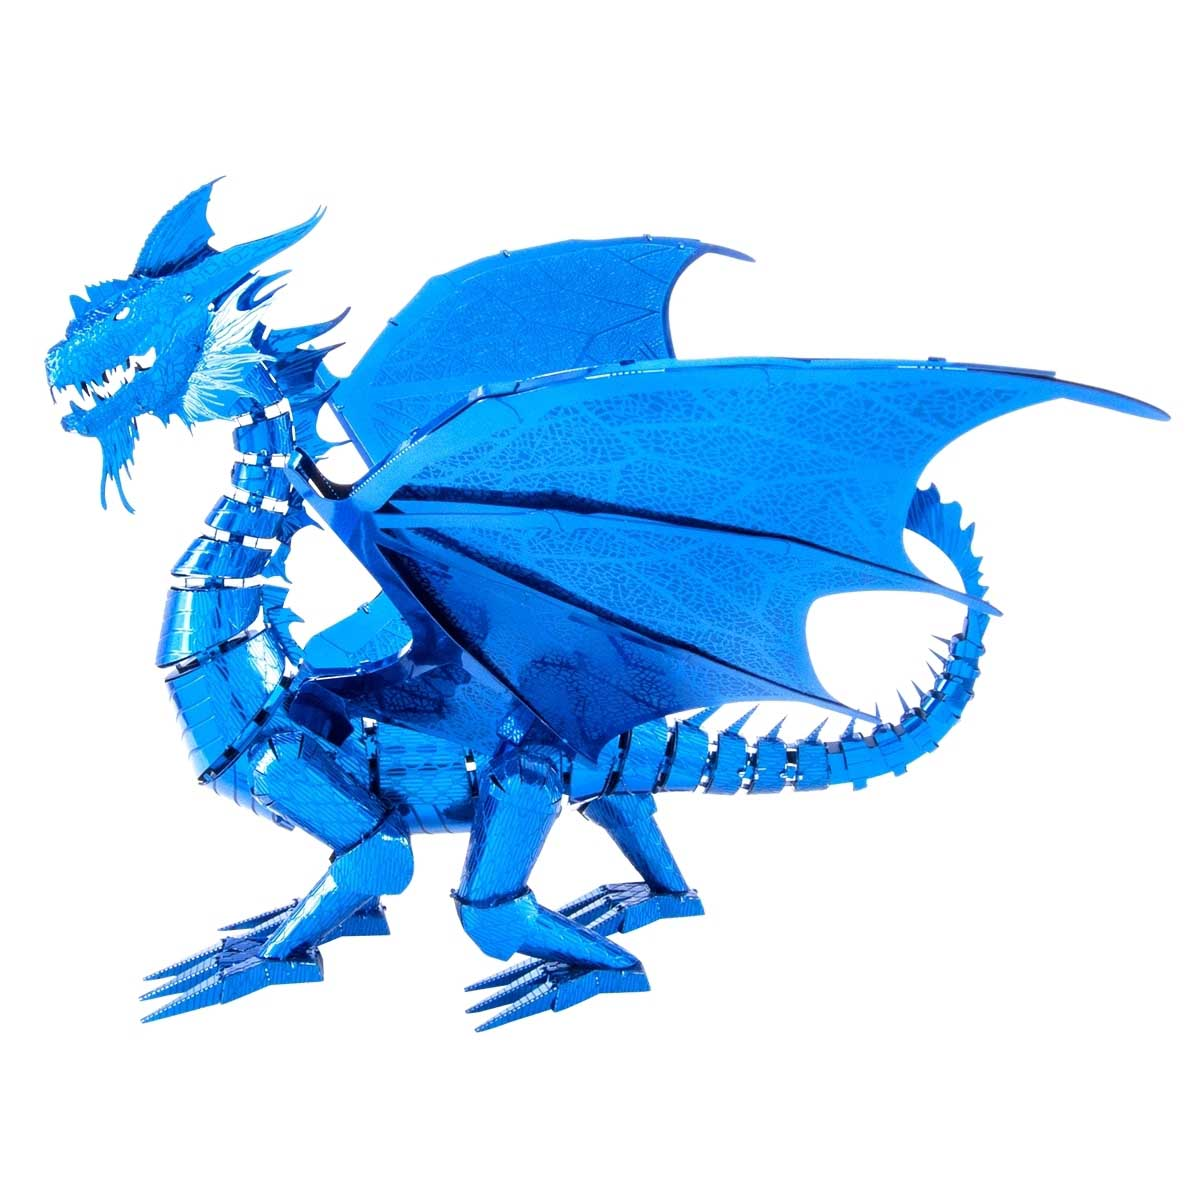 Blue Dragon Dragons Metal Puzzles